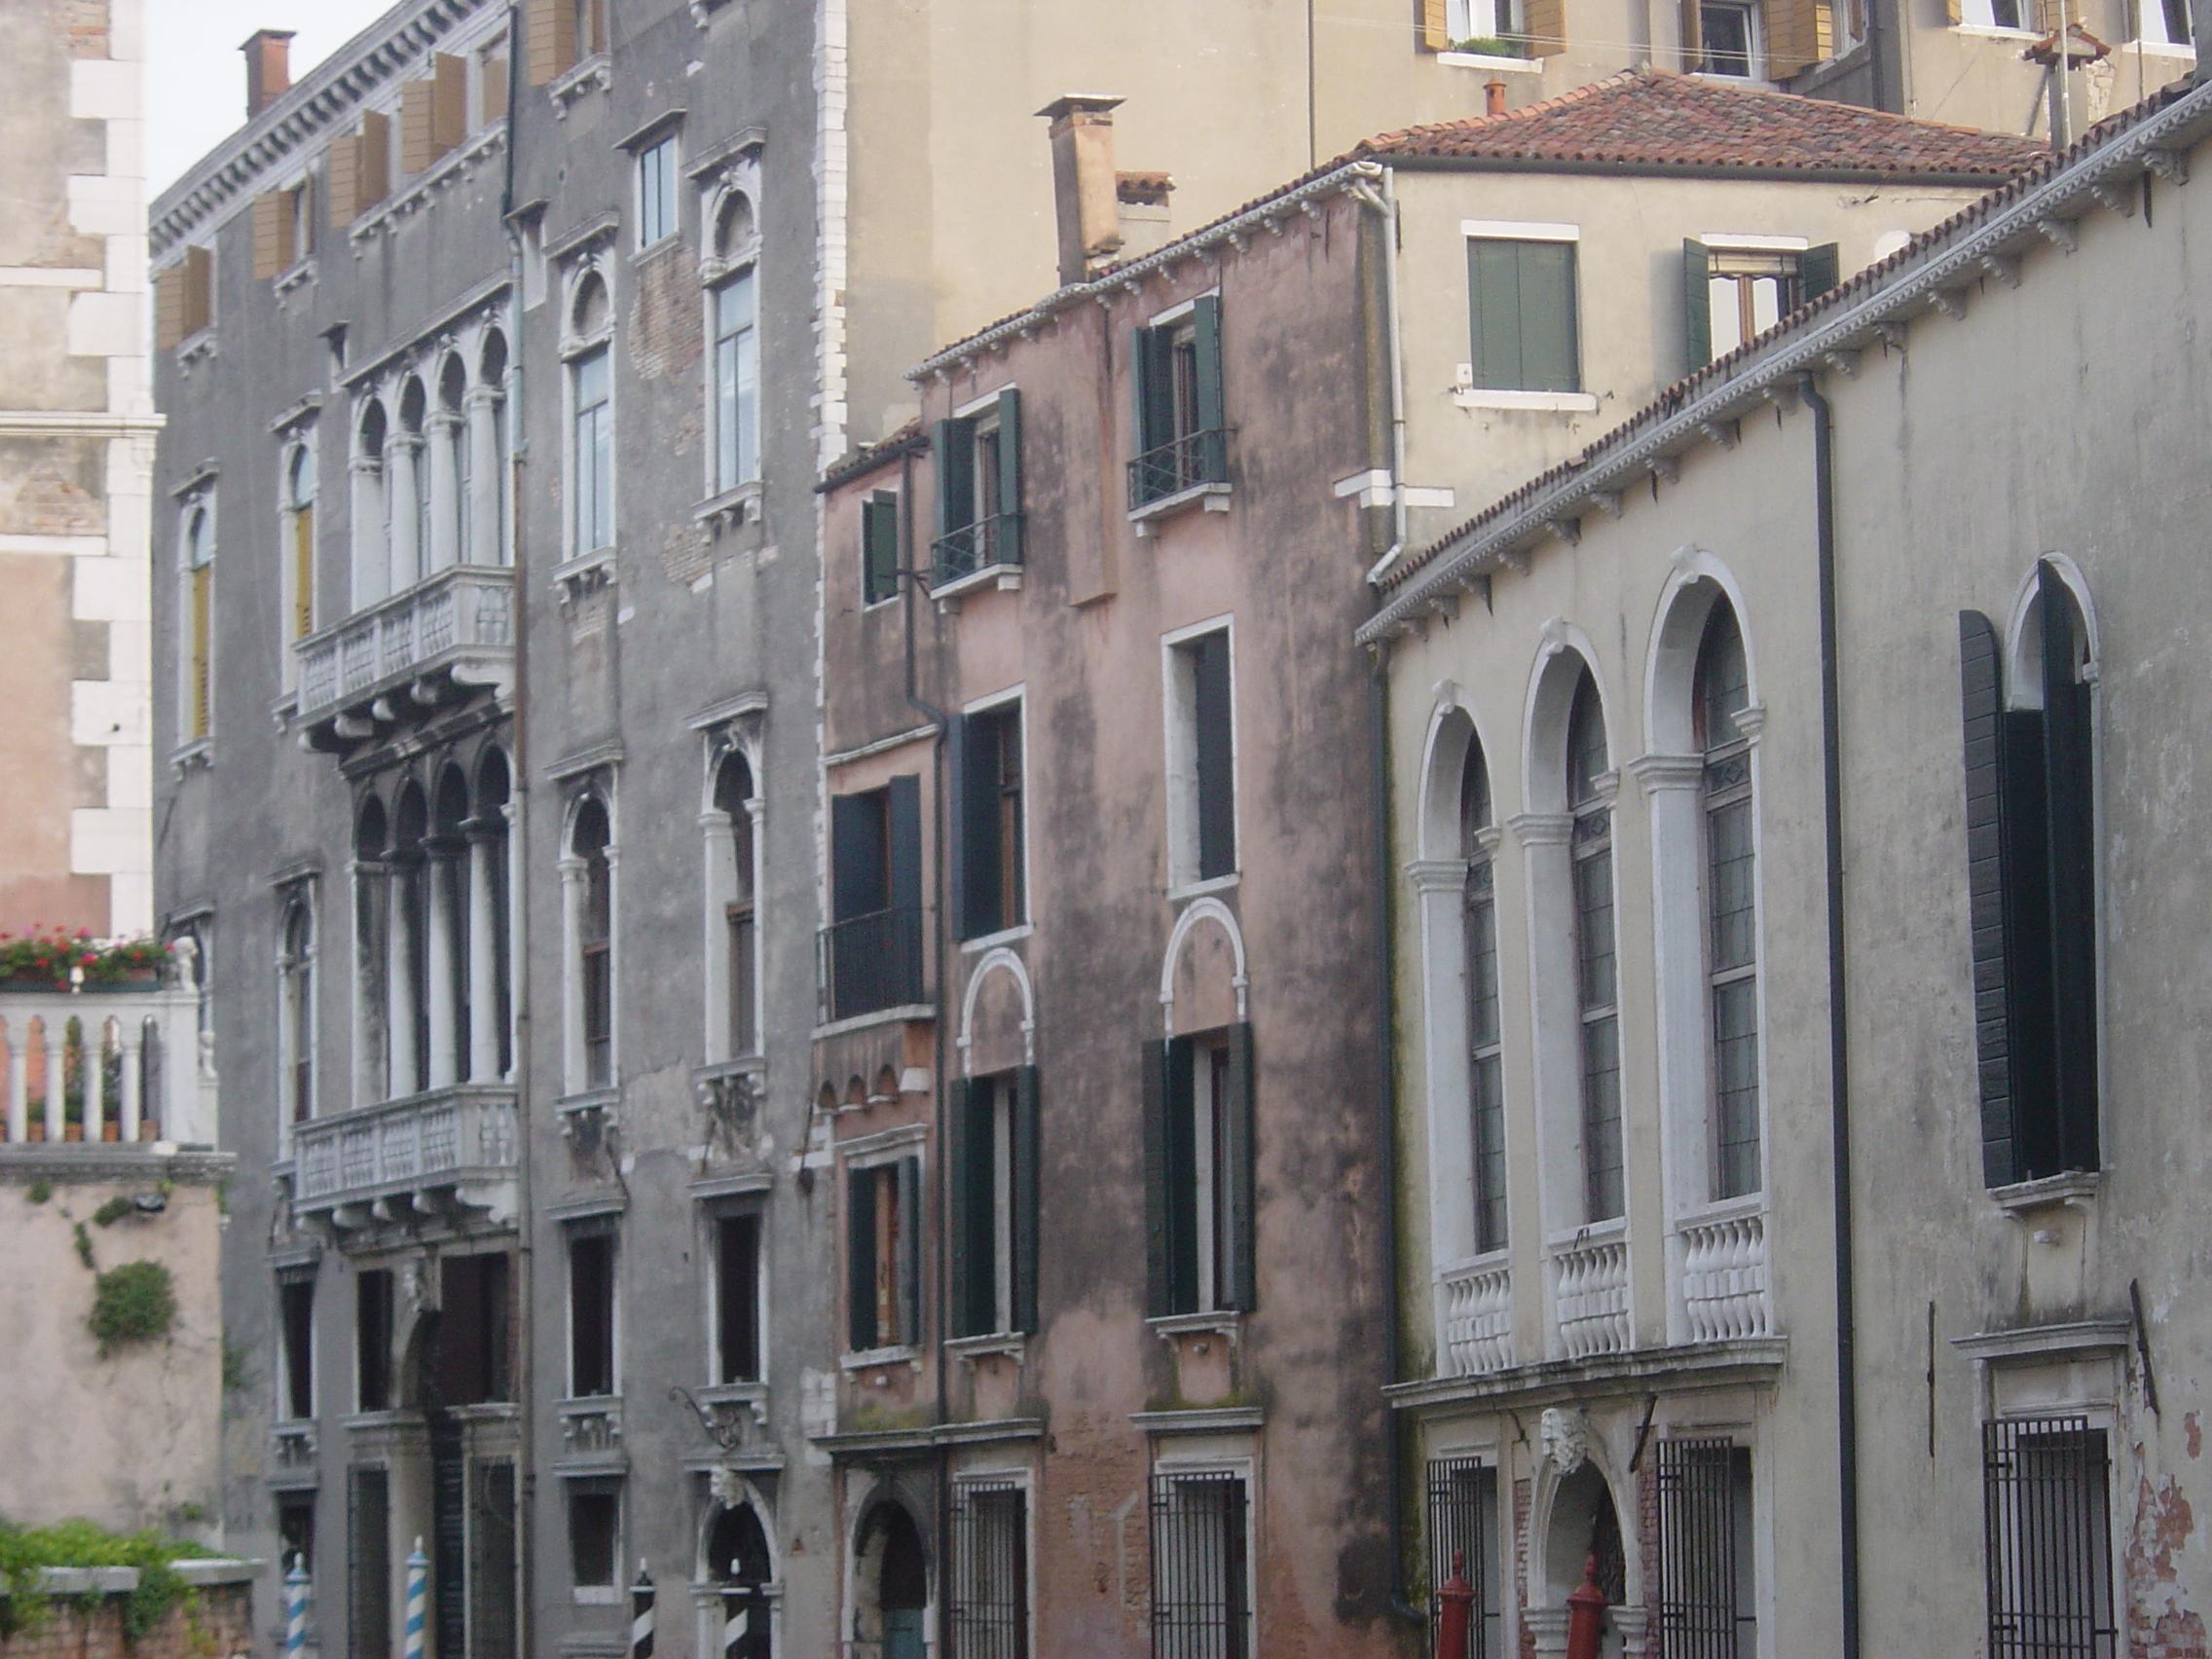 Venice old buildings